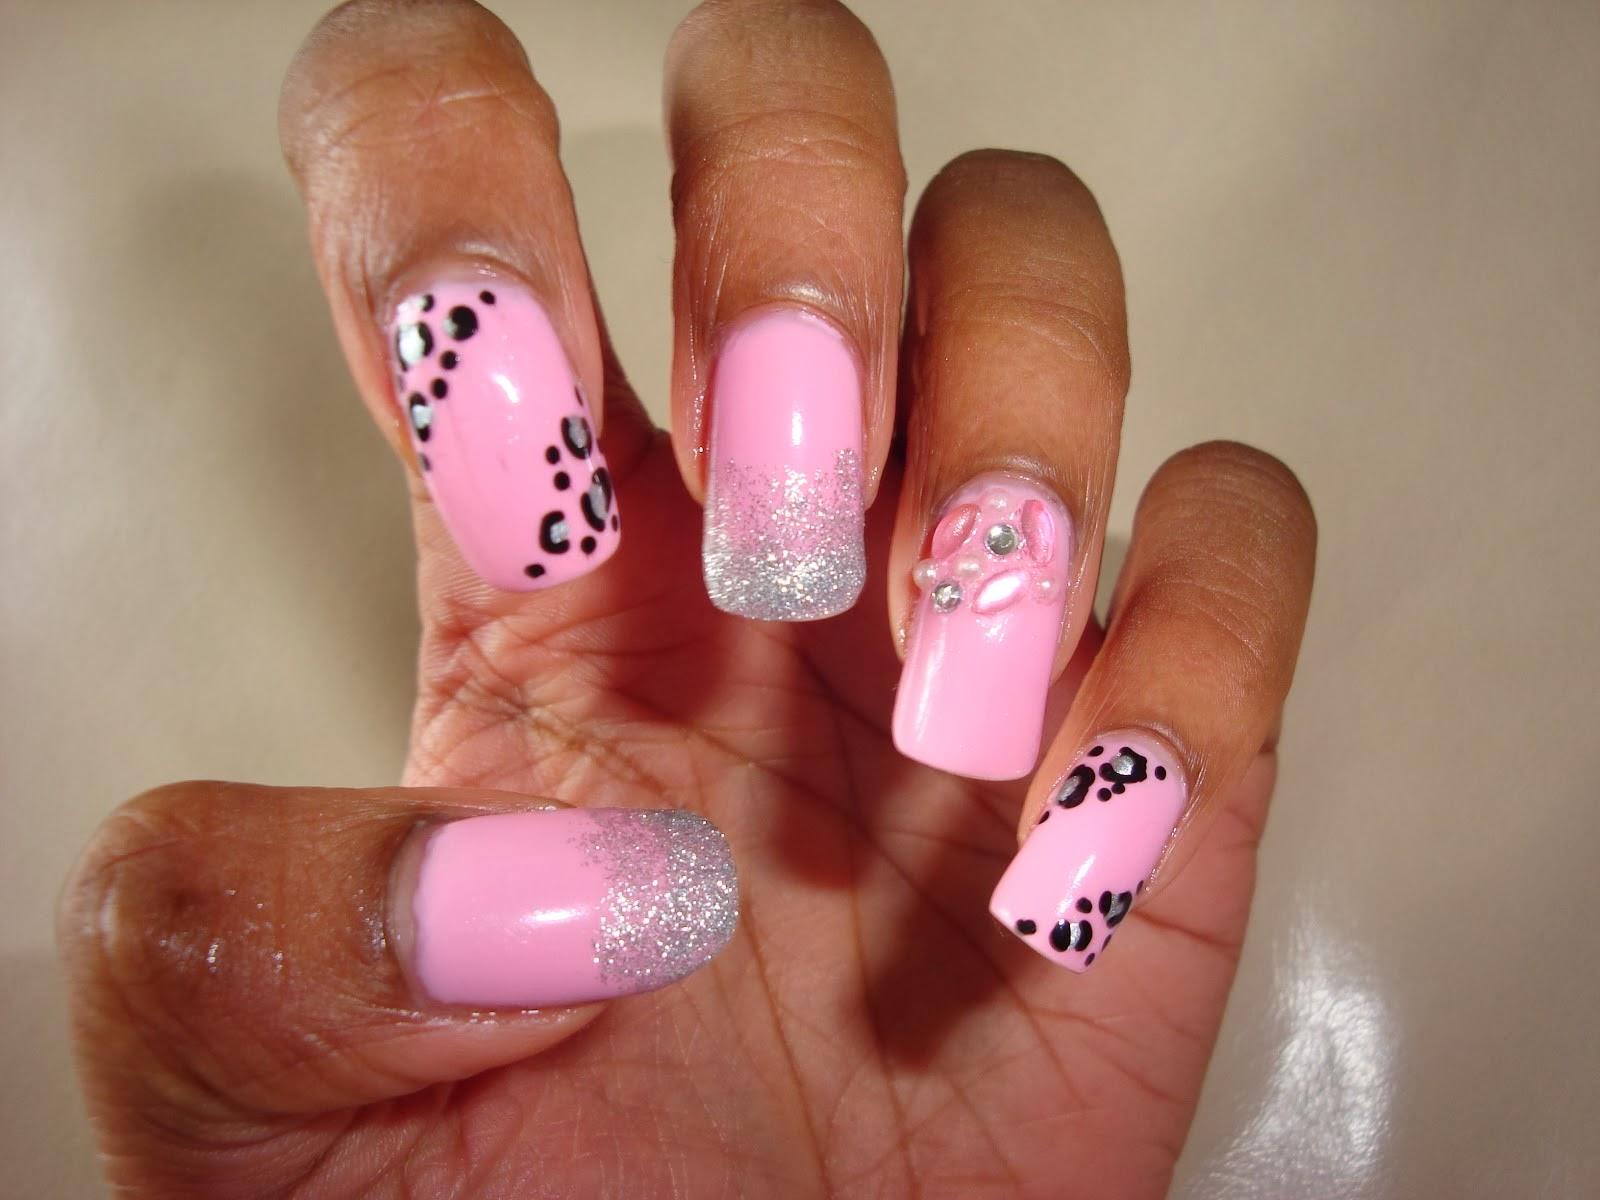 Best Nail Designs - Pccala